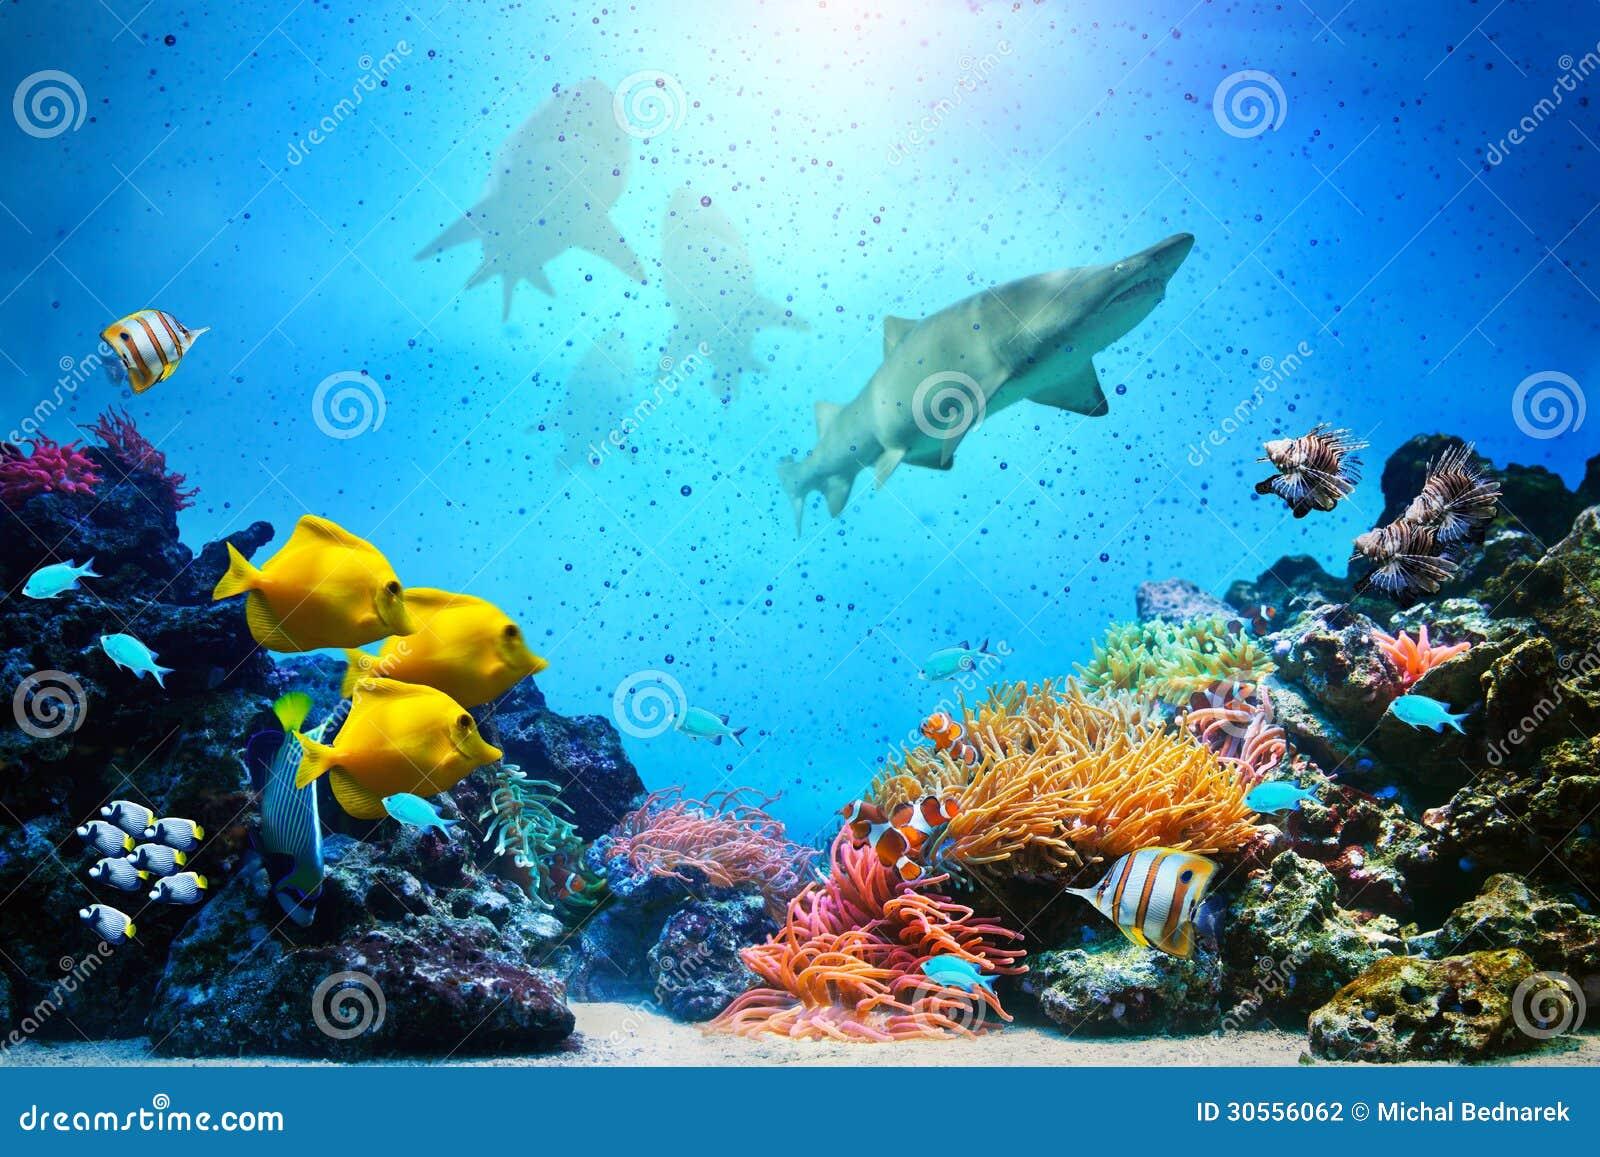 Underwater scene. Coral reef, fish groups